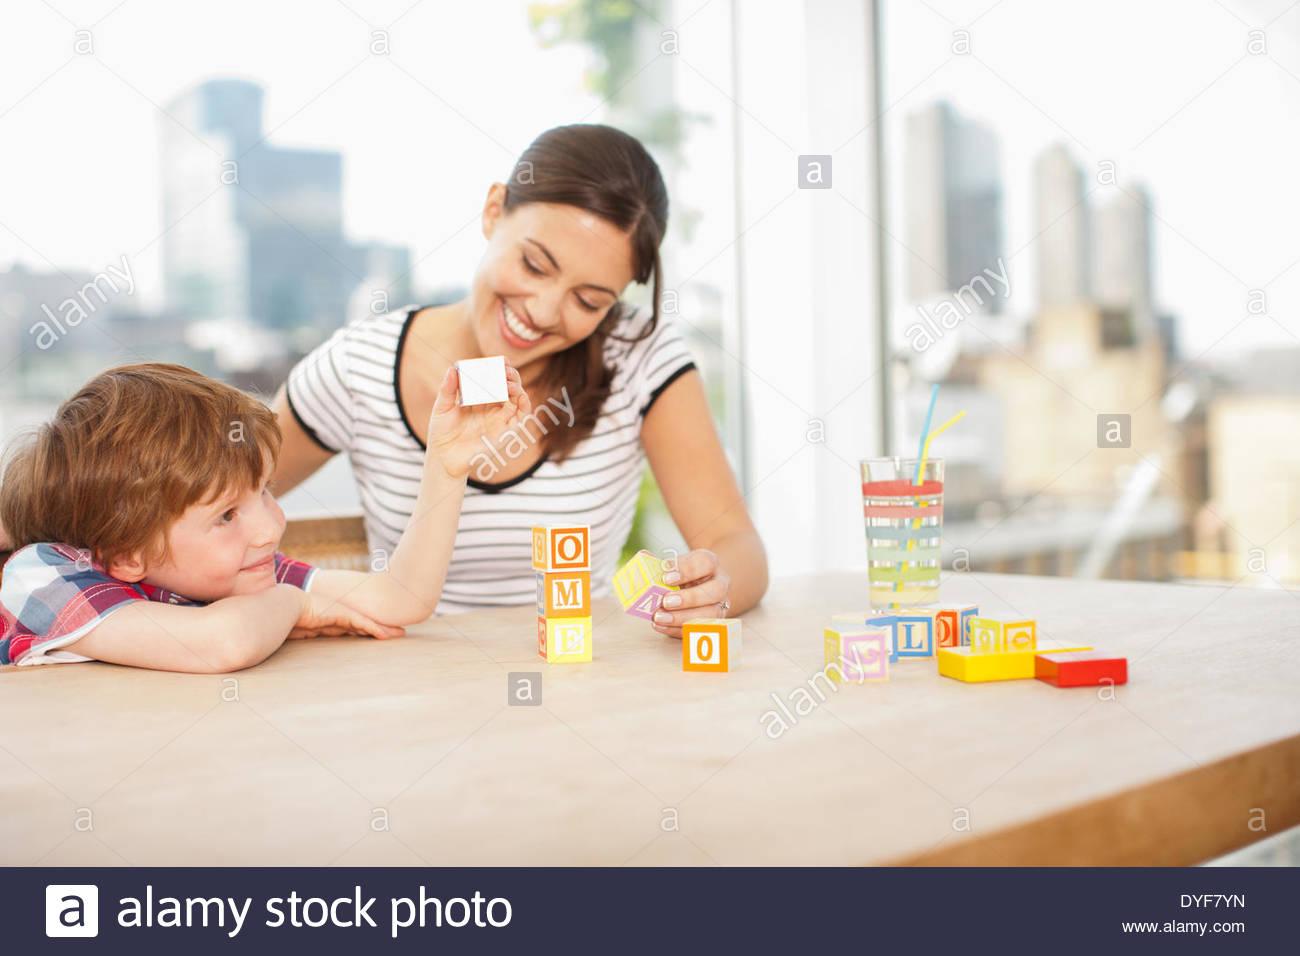 Mother watching son stacking alphabet blocks spelling Â'homeÂ' - Stock Image